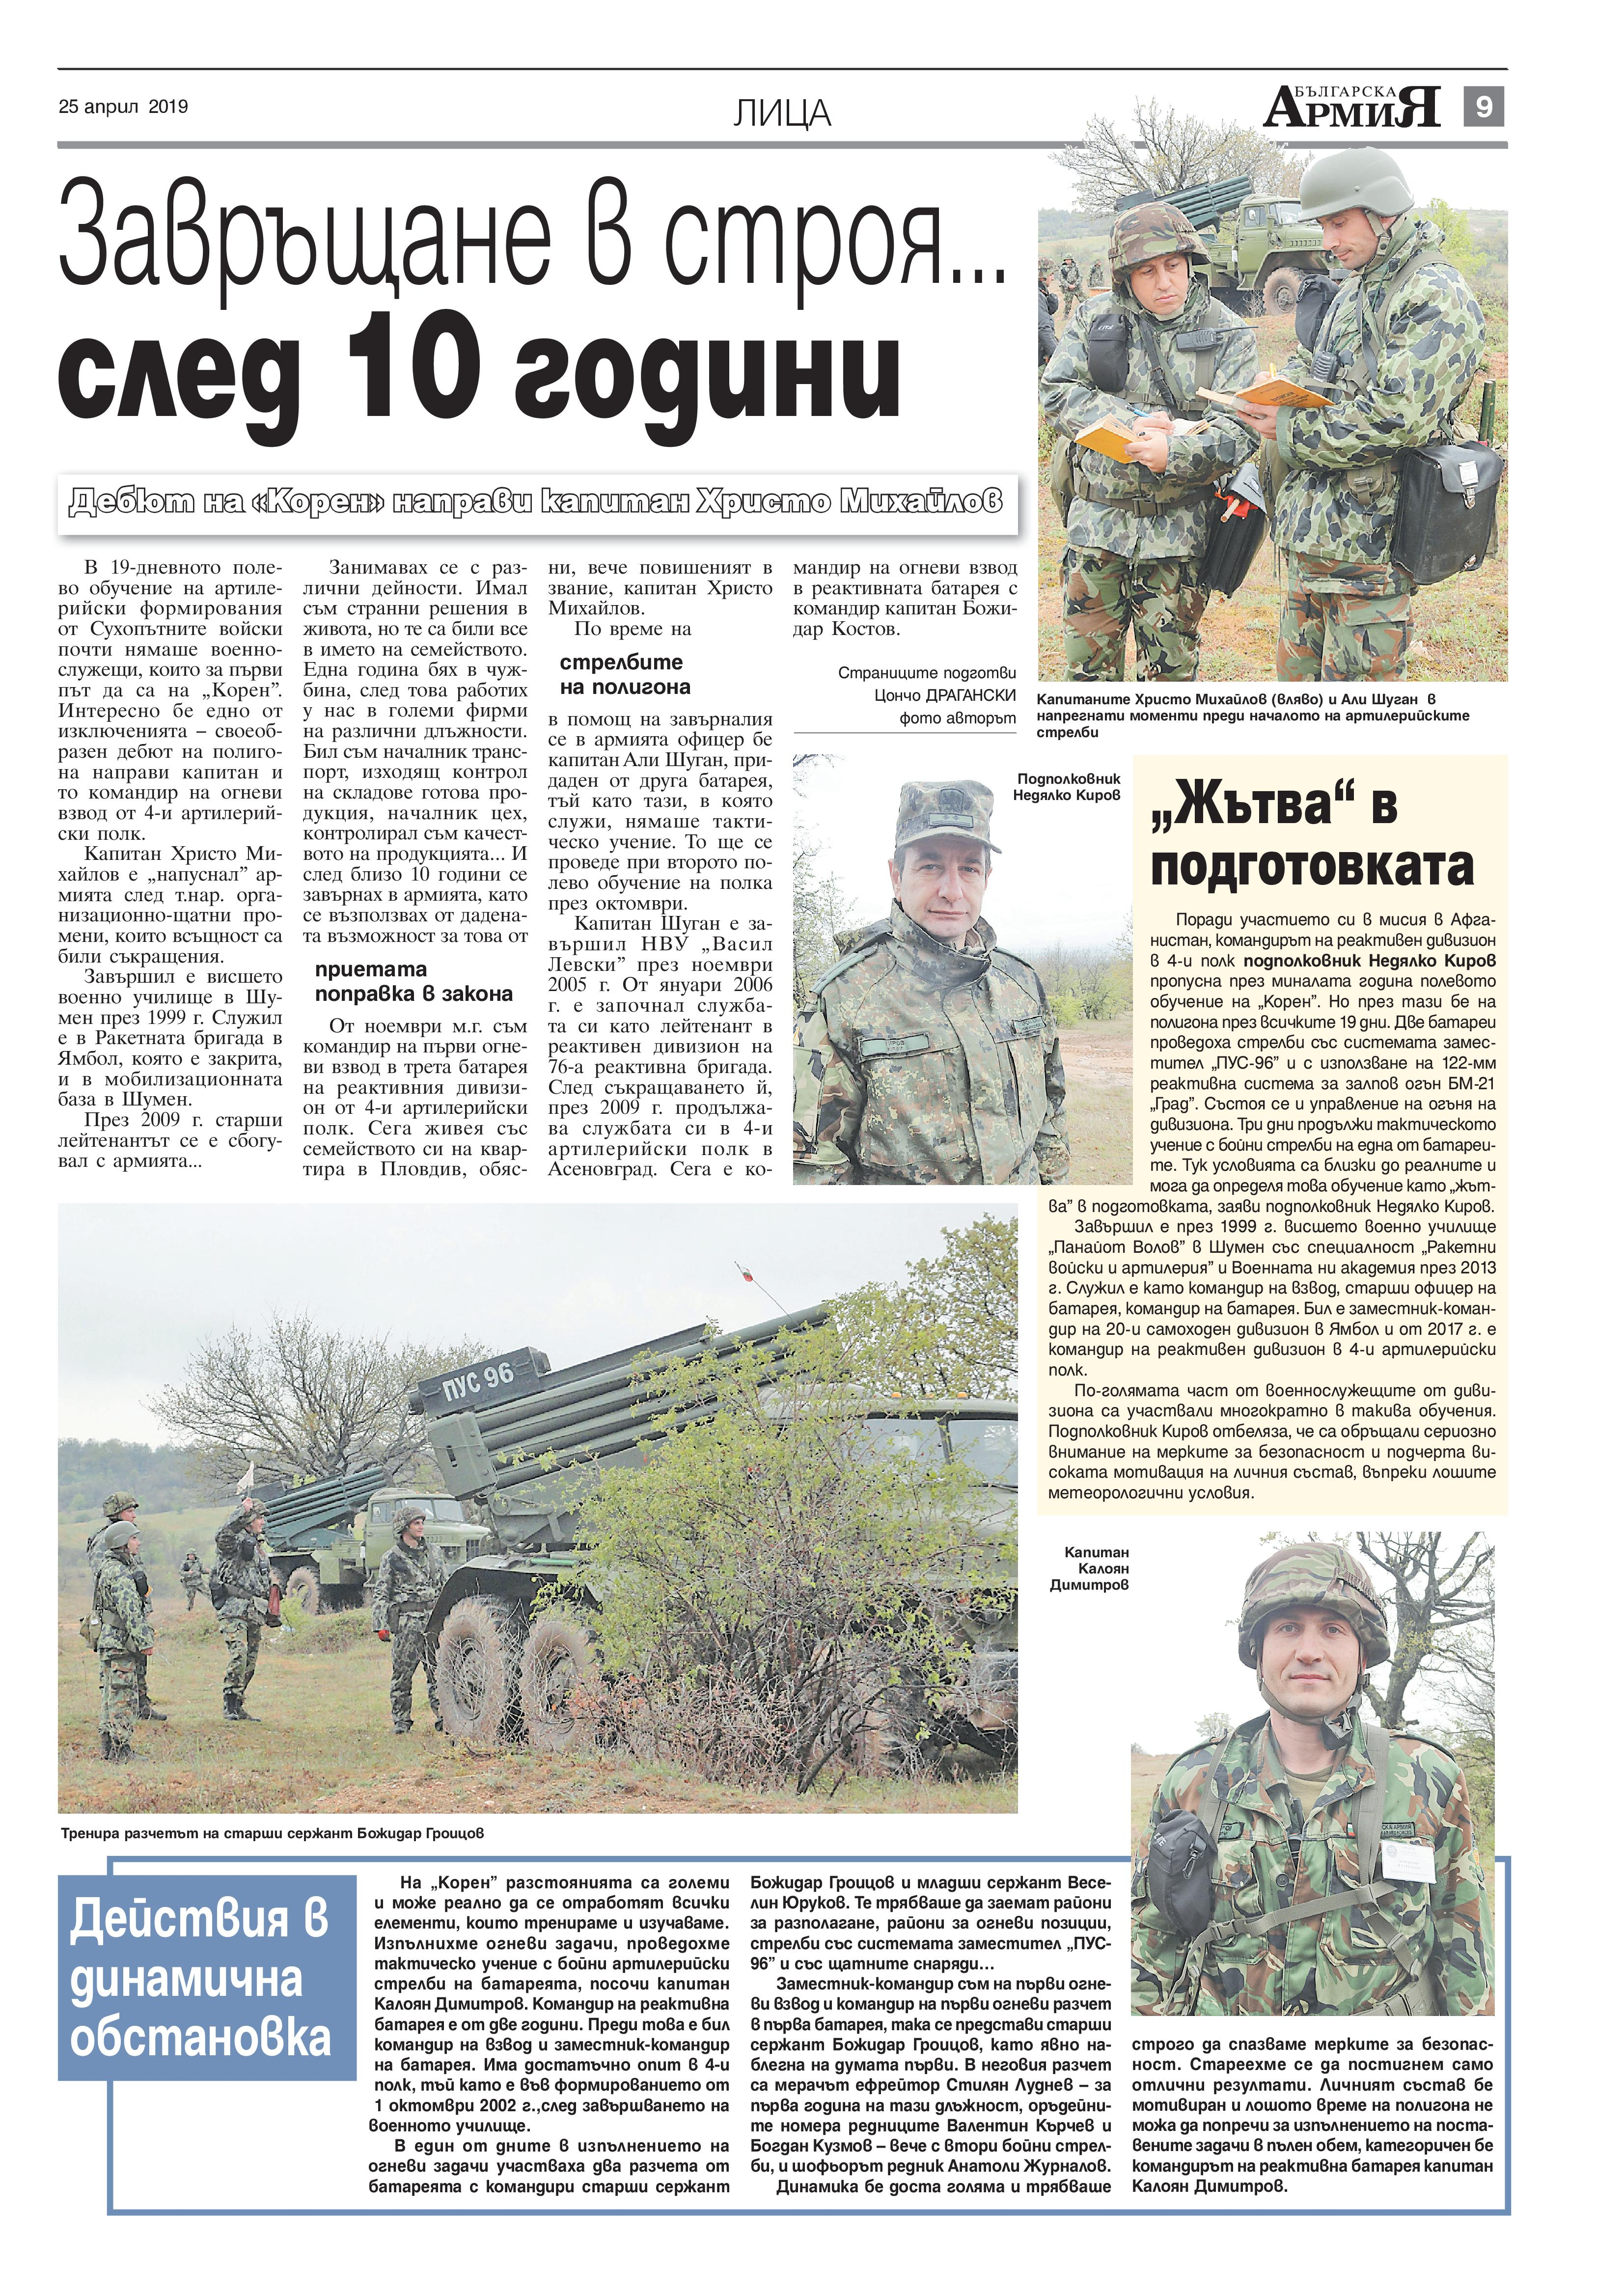 https://www.armymedia.bg/wp-content/uploads/2015/06/09-27.jpg